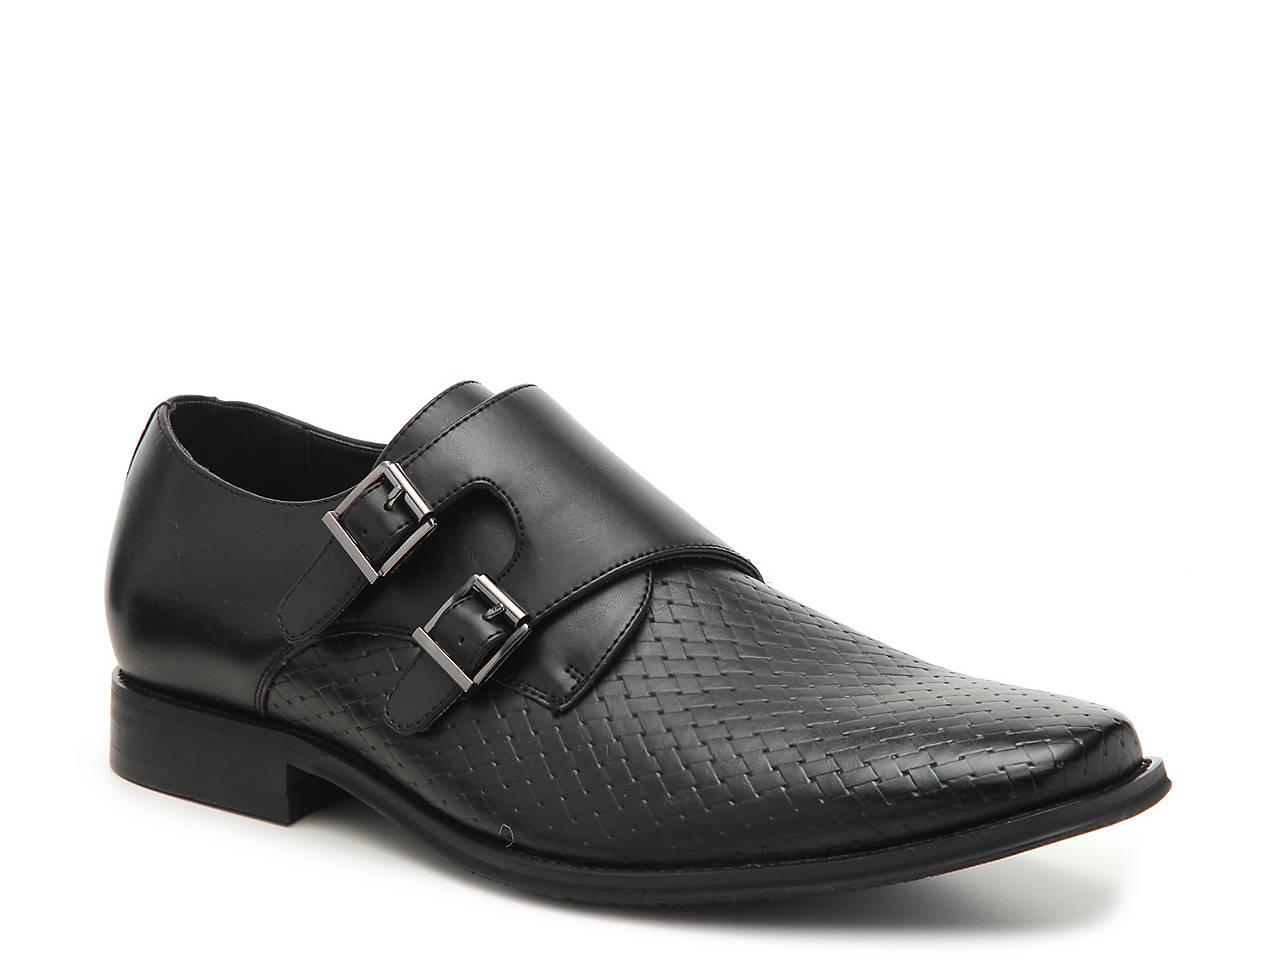 Xray Barbaro Men's Monk Strap ... Dress Shoes mbm6Nraqoo